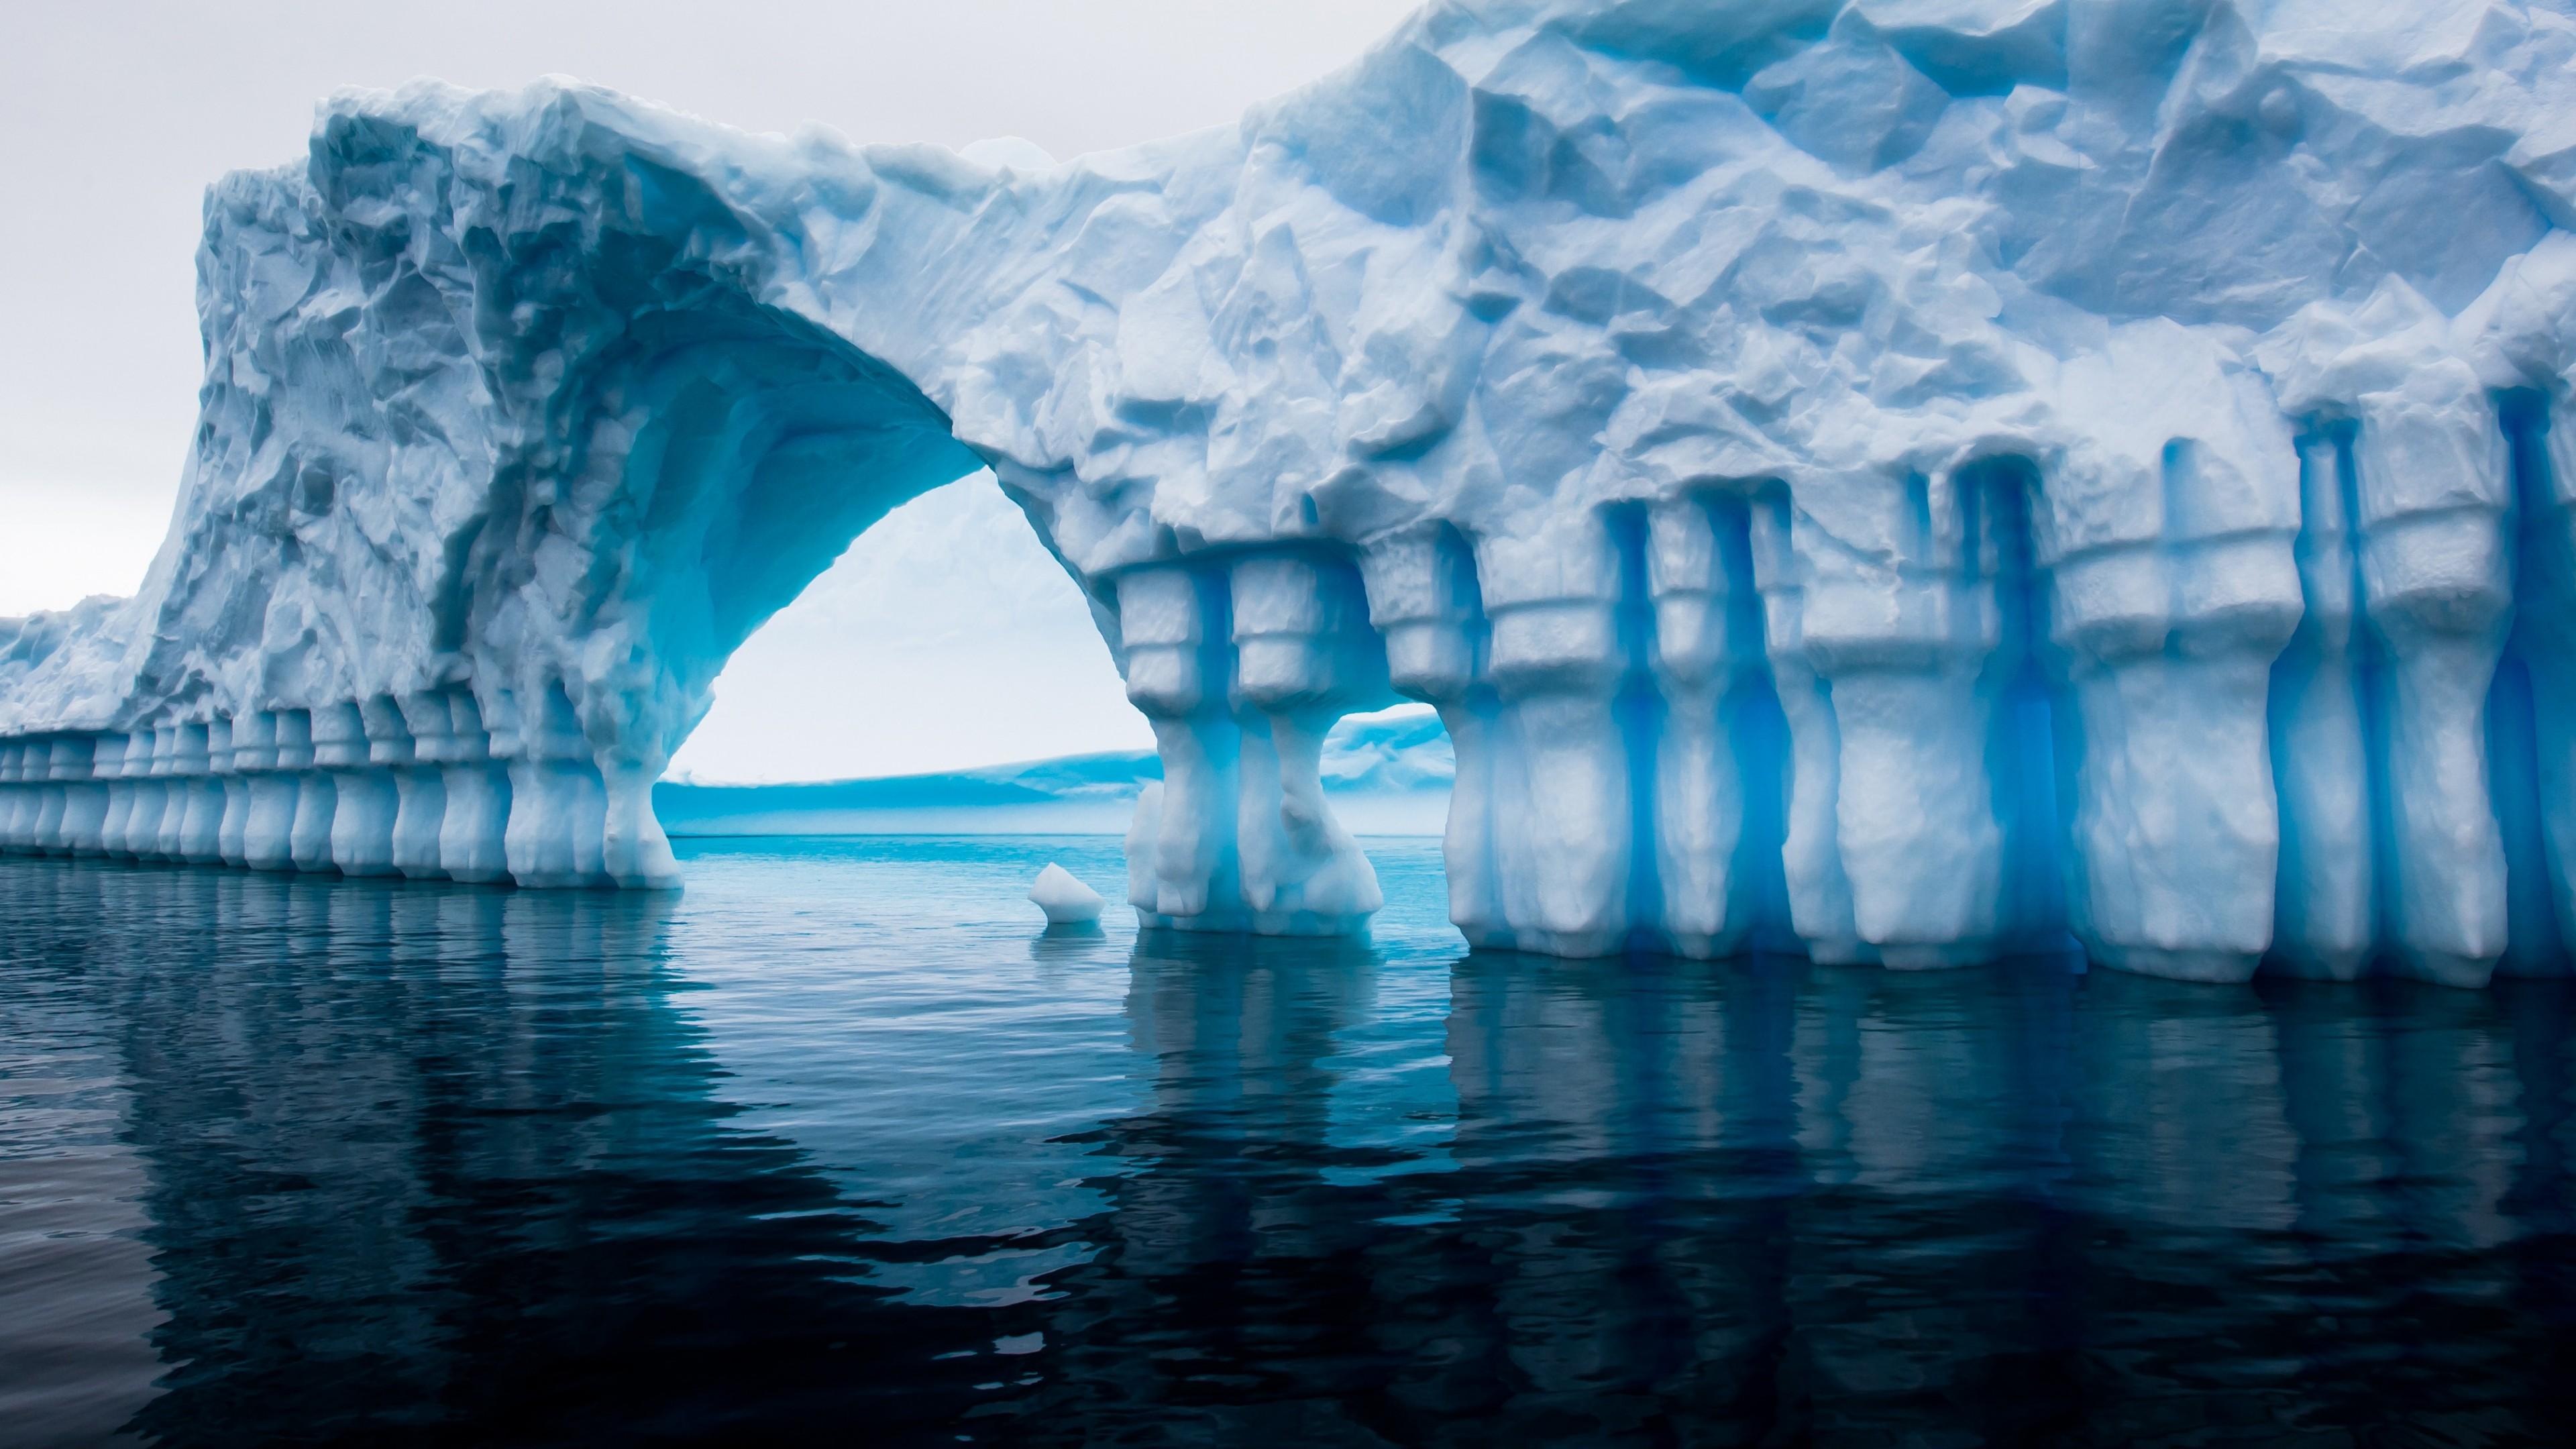 Wallpaper Icebern in Antarctica's sea